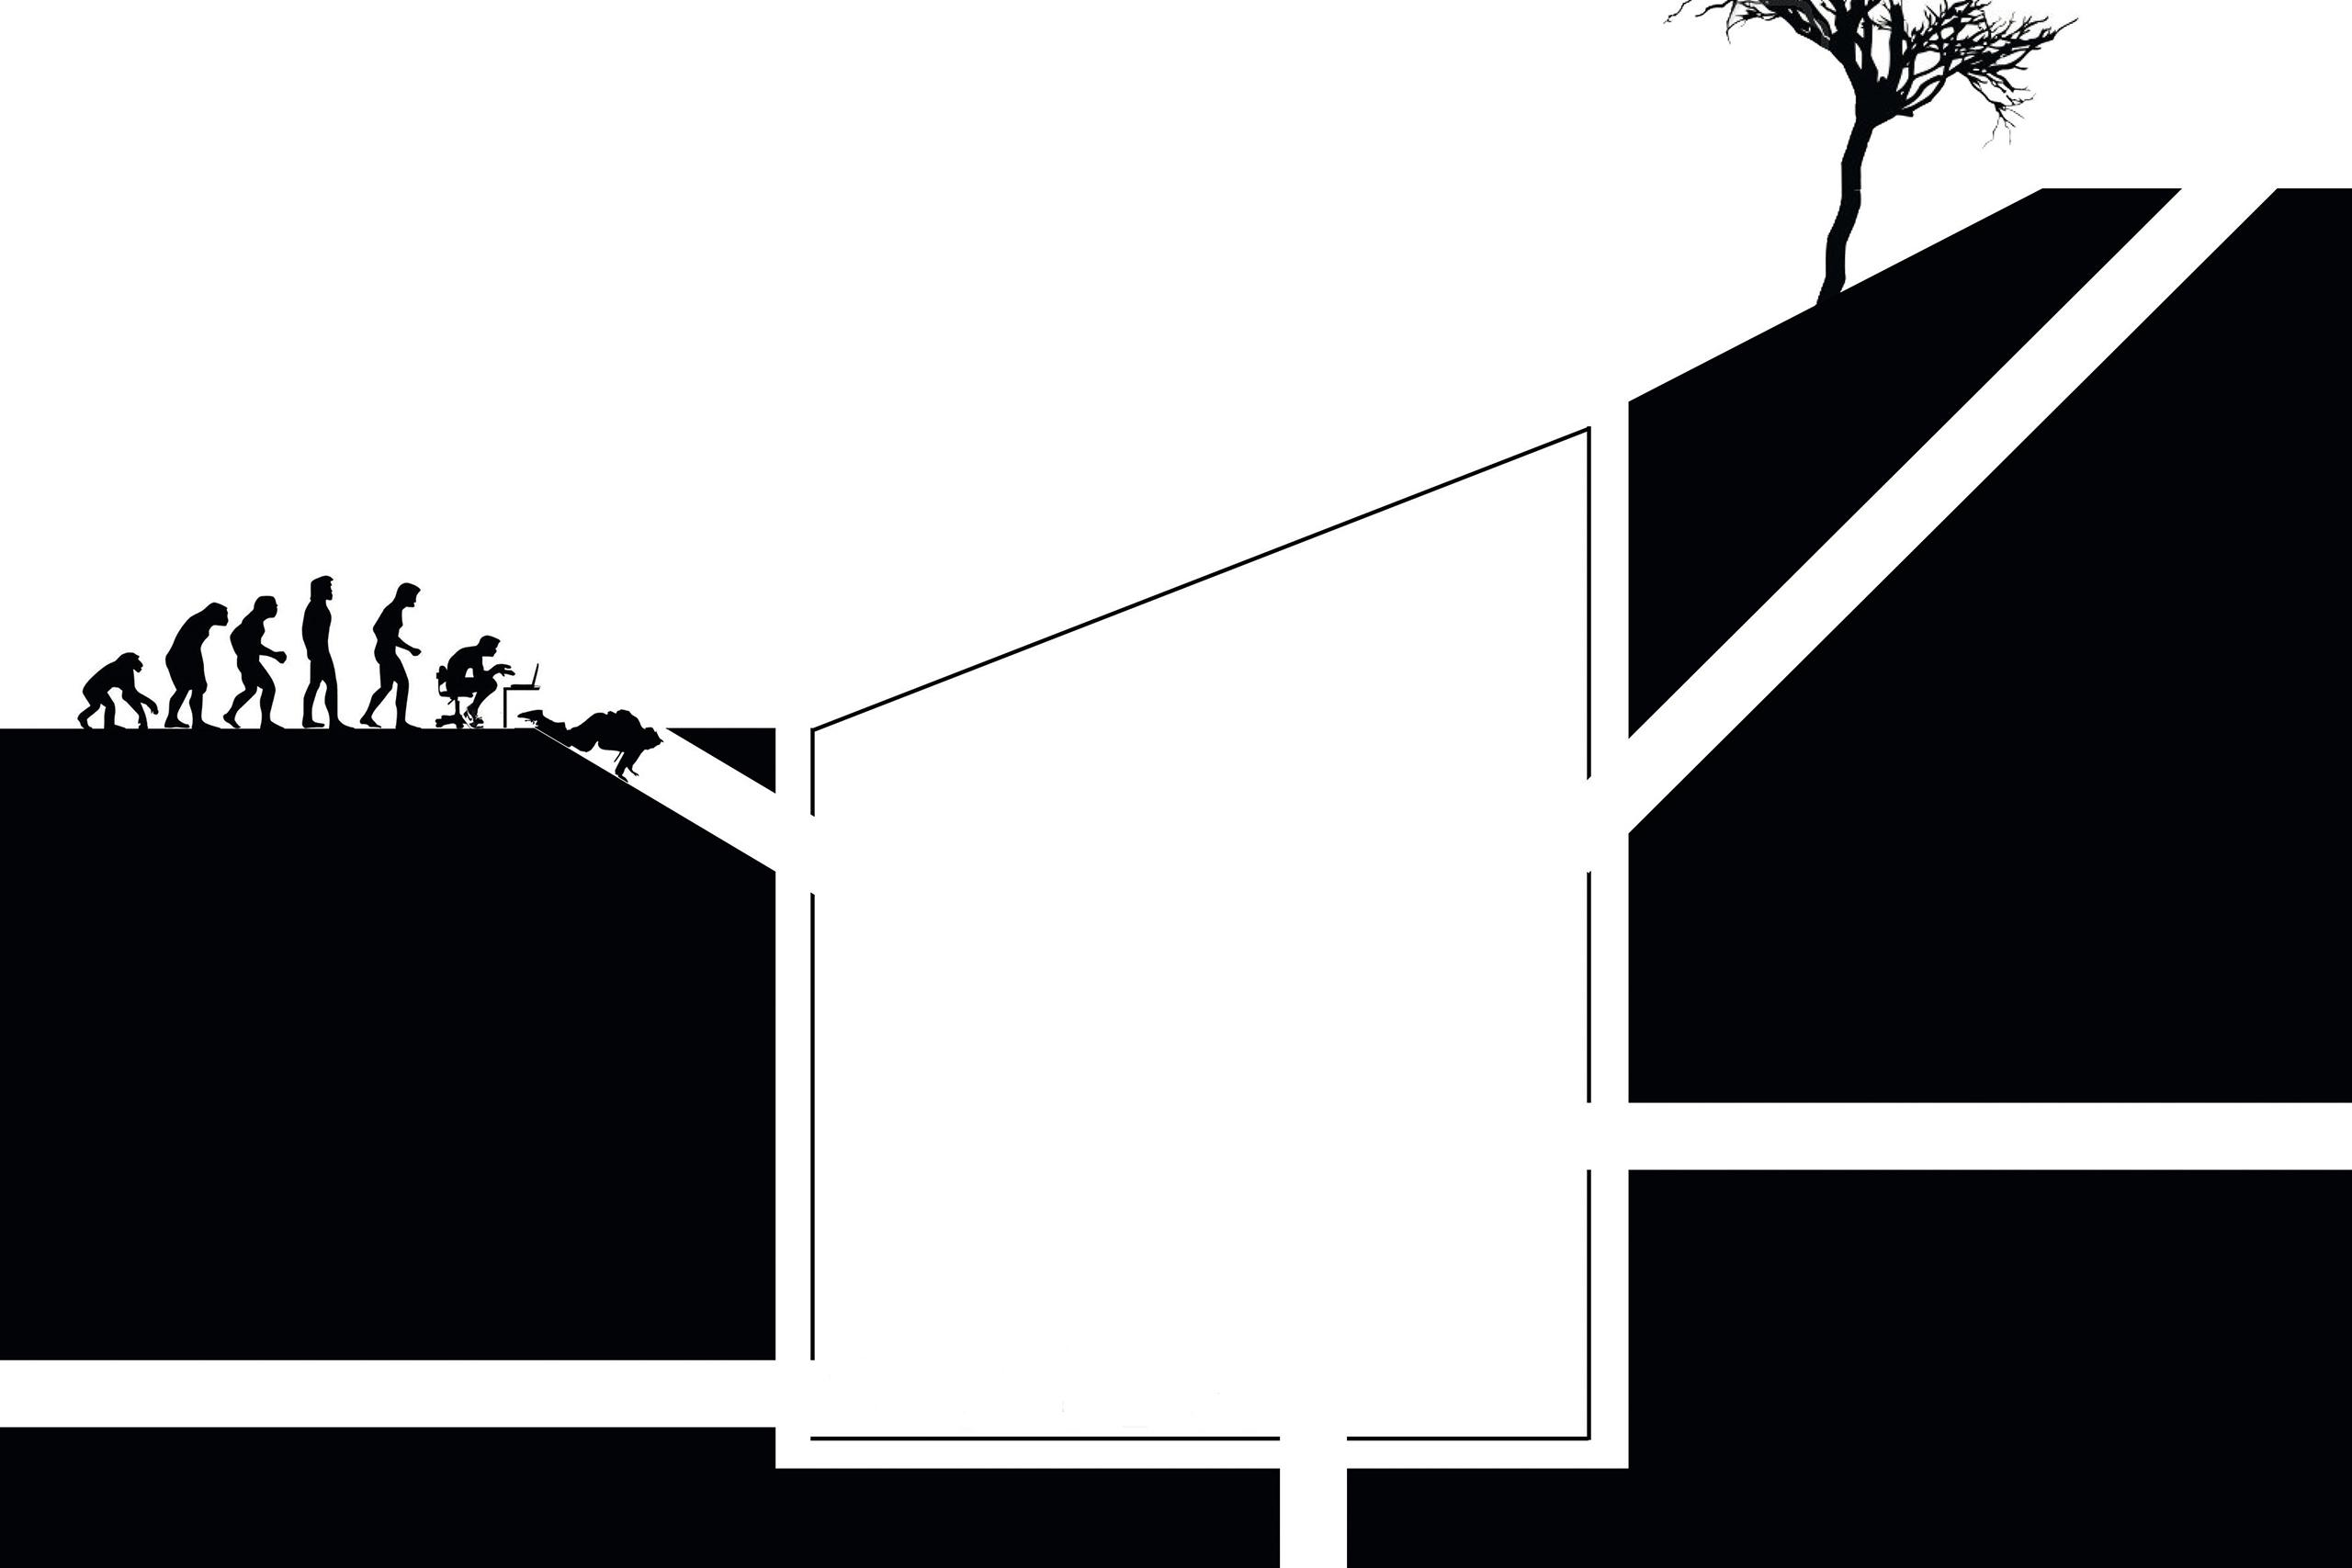 New Vault Order – Timo Schroeder | Illustration: Timo Schroeder